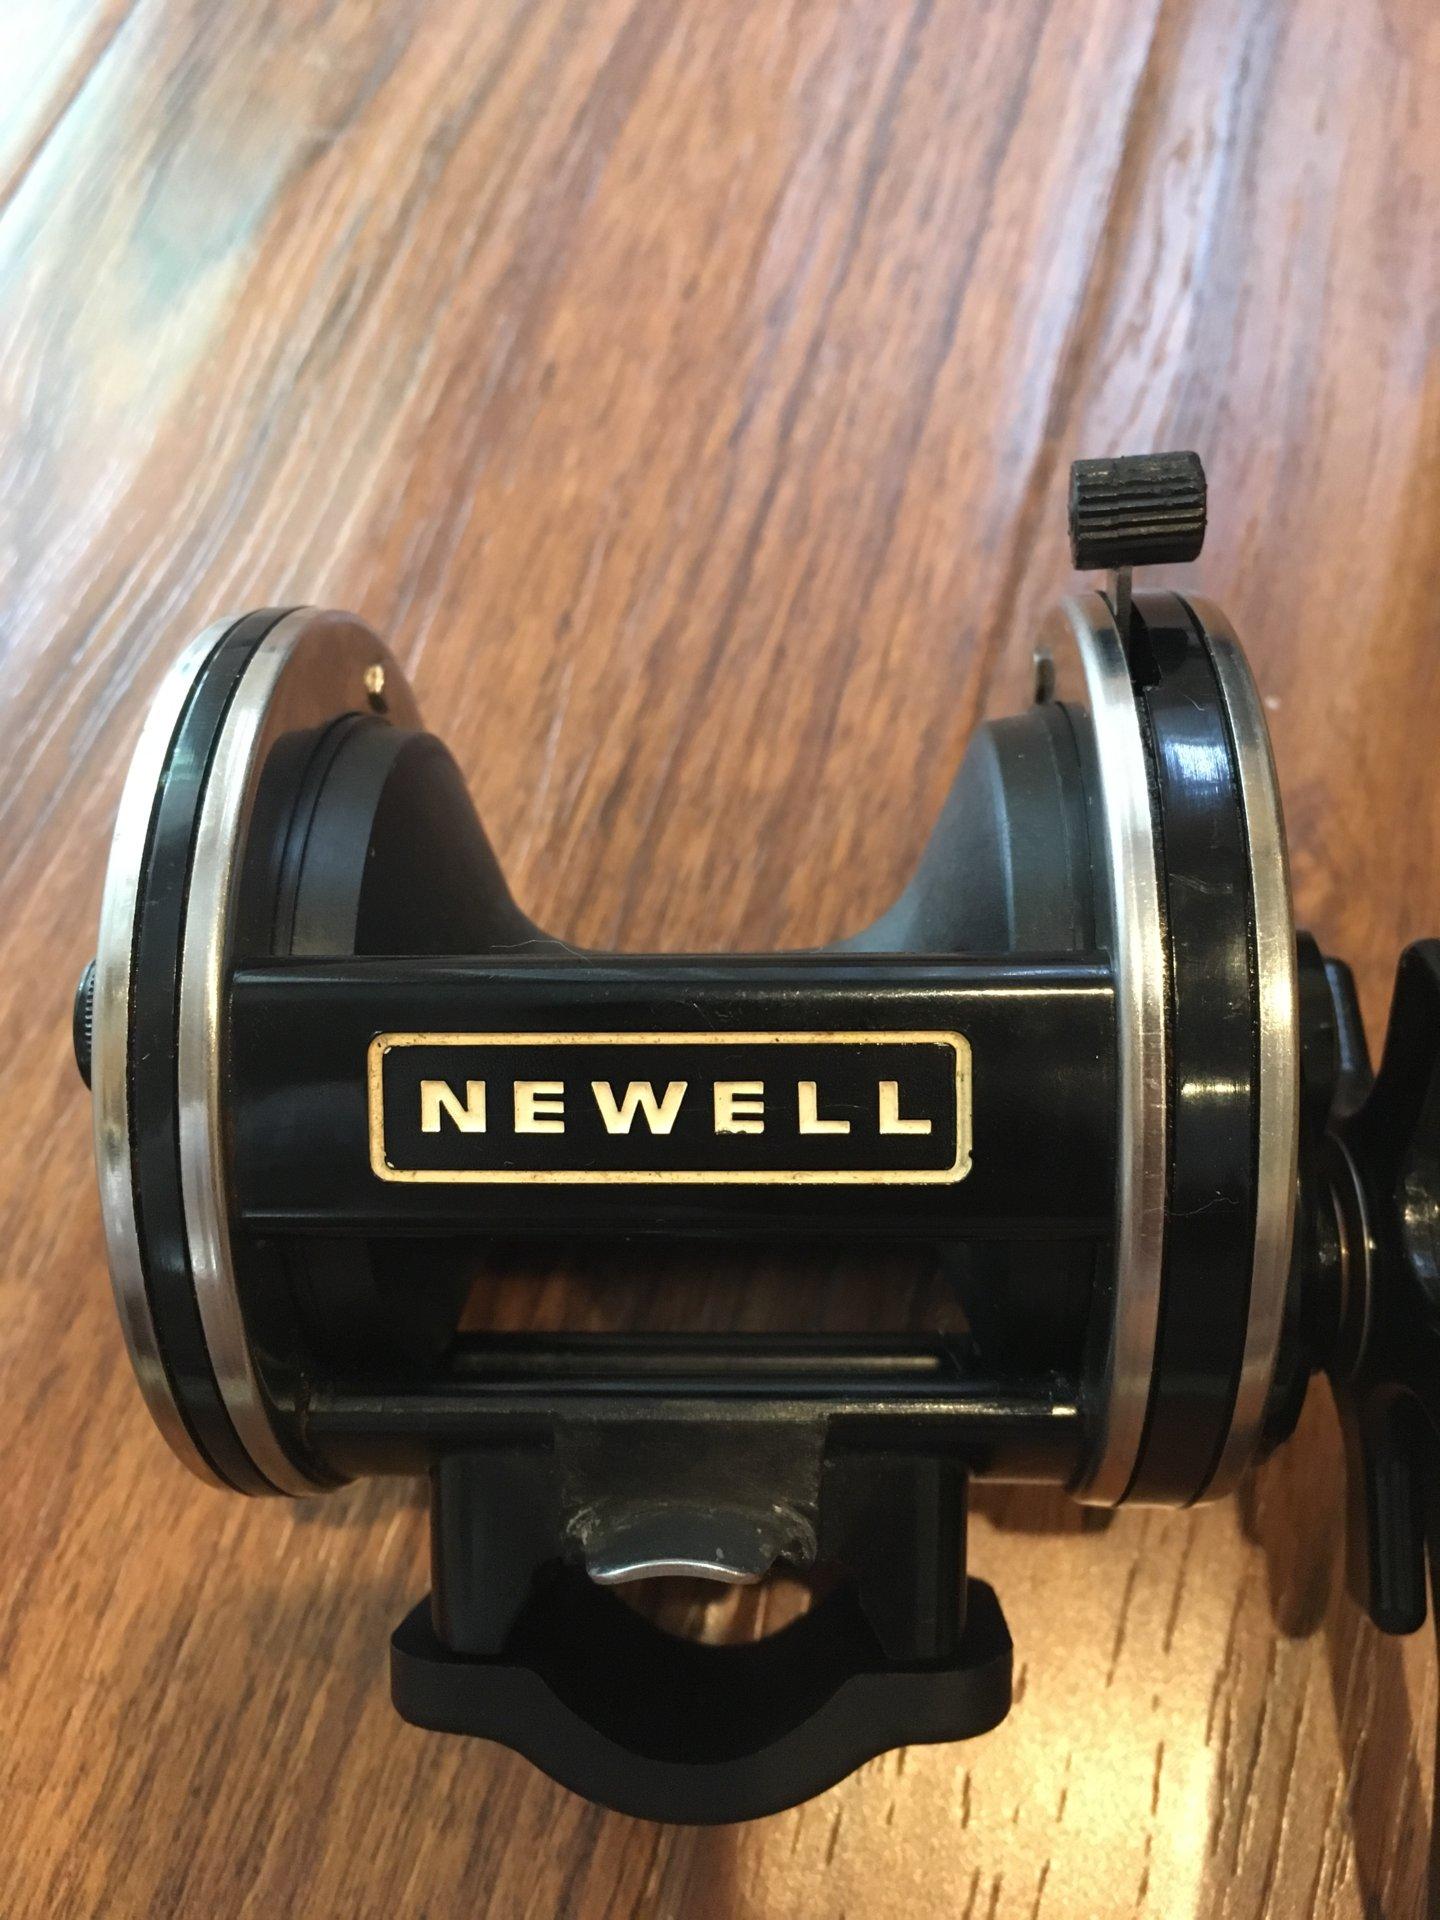 Newell-002.JPG